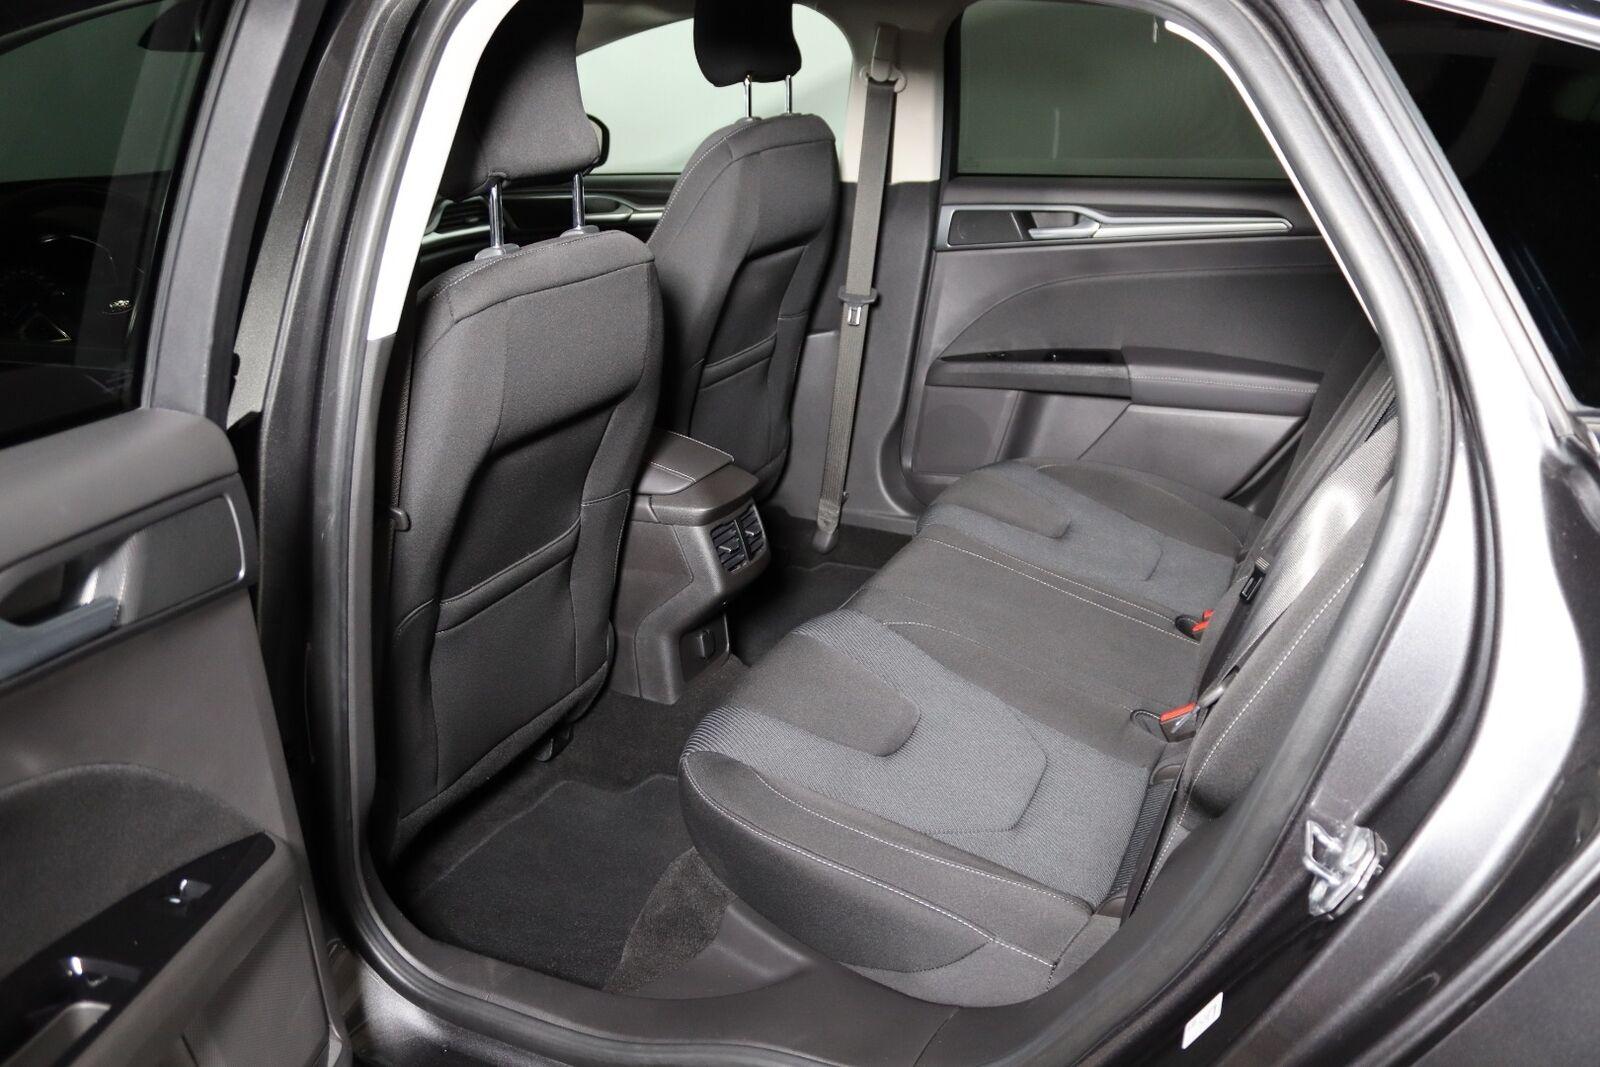 Ford Mondeo 2,0 TDCi 180 Titanium aut. - billede 7